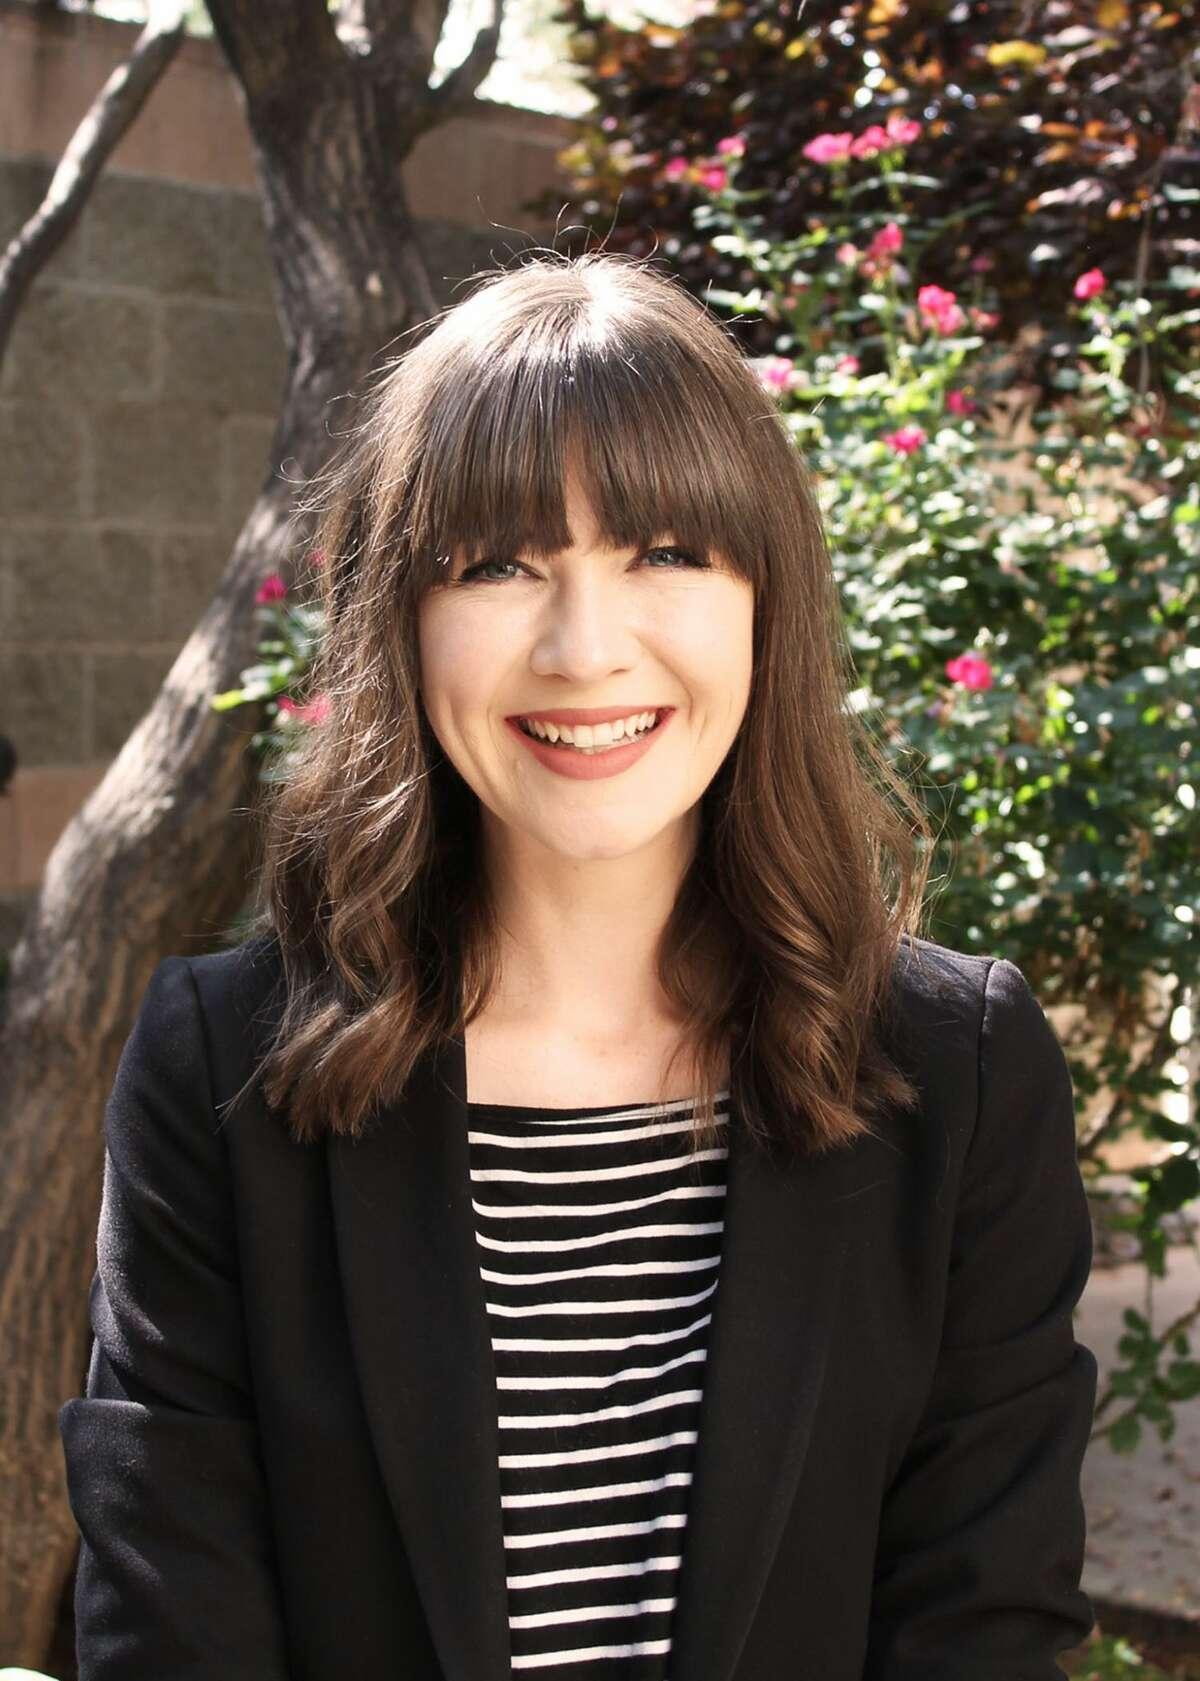 Clarissa Toll is community relations coordinator at Midland Health.